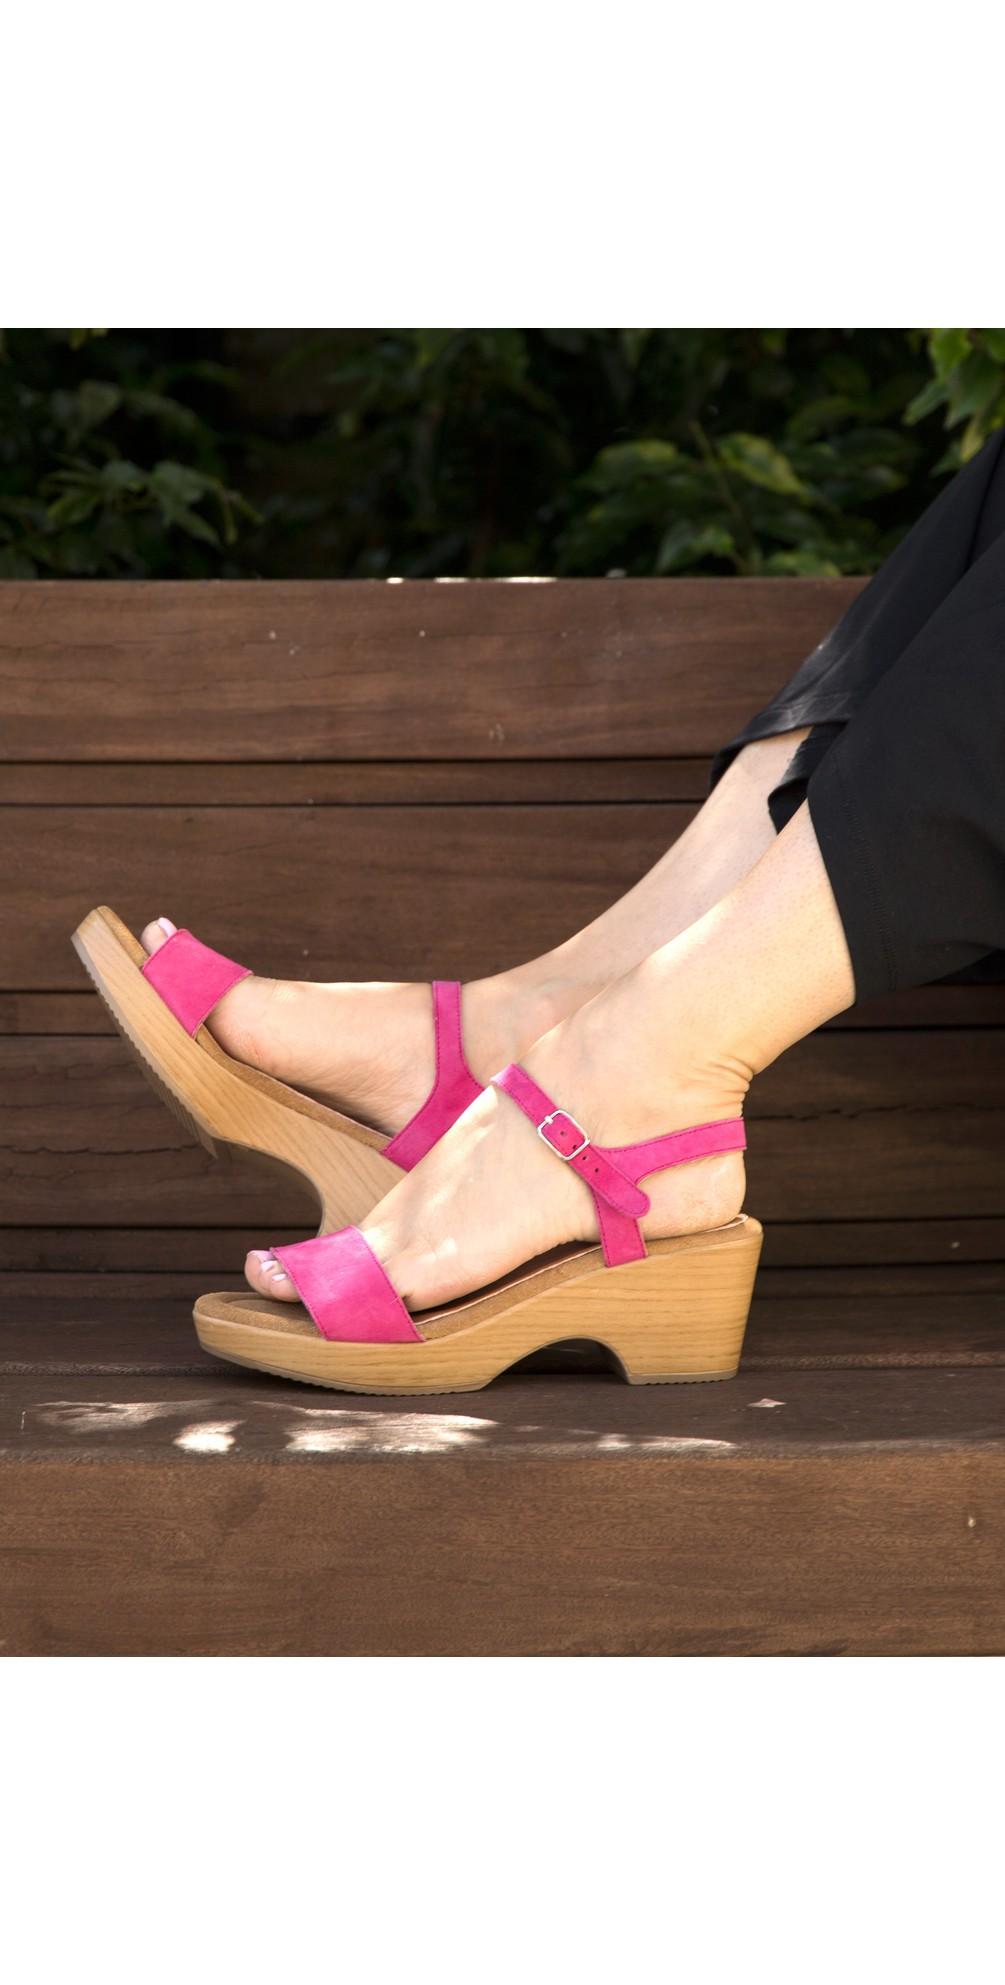 Aneka Icon Fresa Pink Suede Wedge Sandal main image